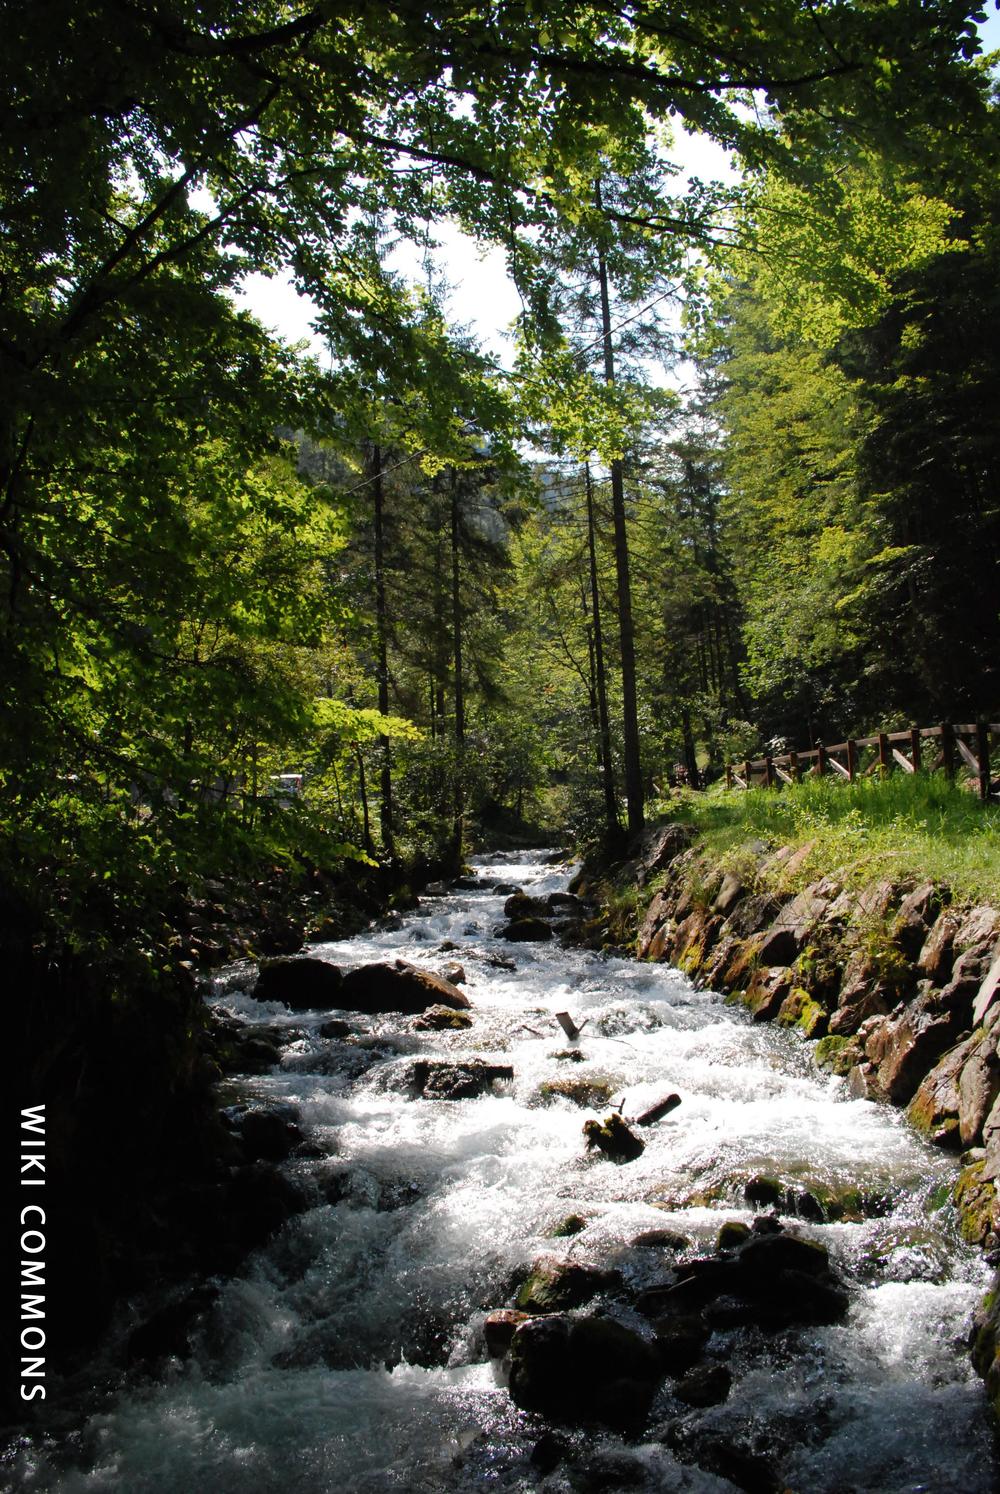 natural vegetation and wildlife wikipedia